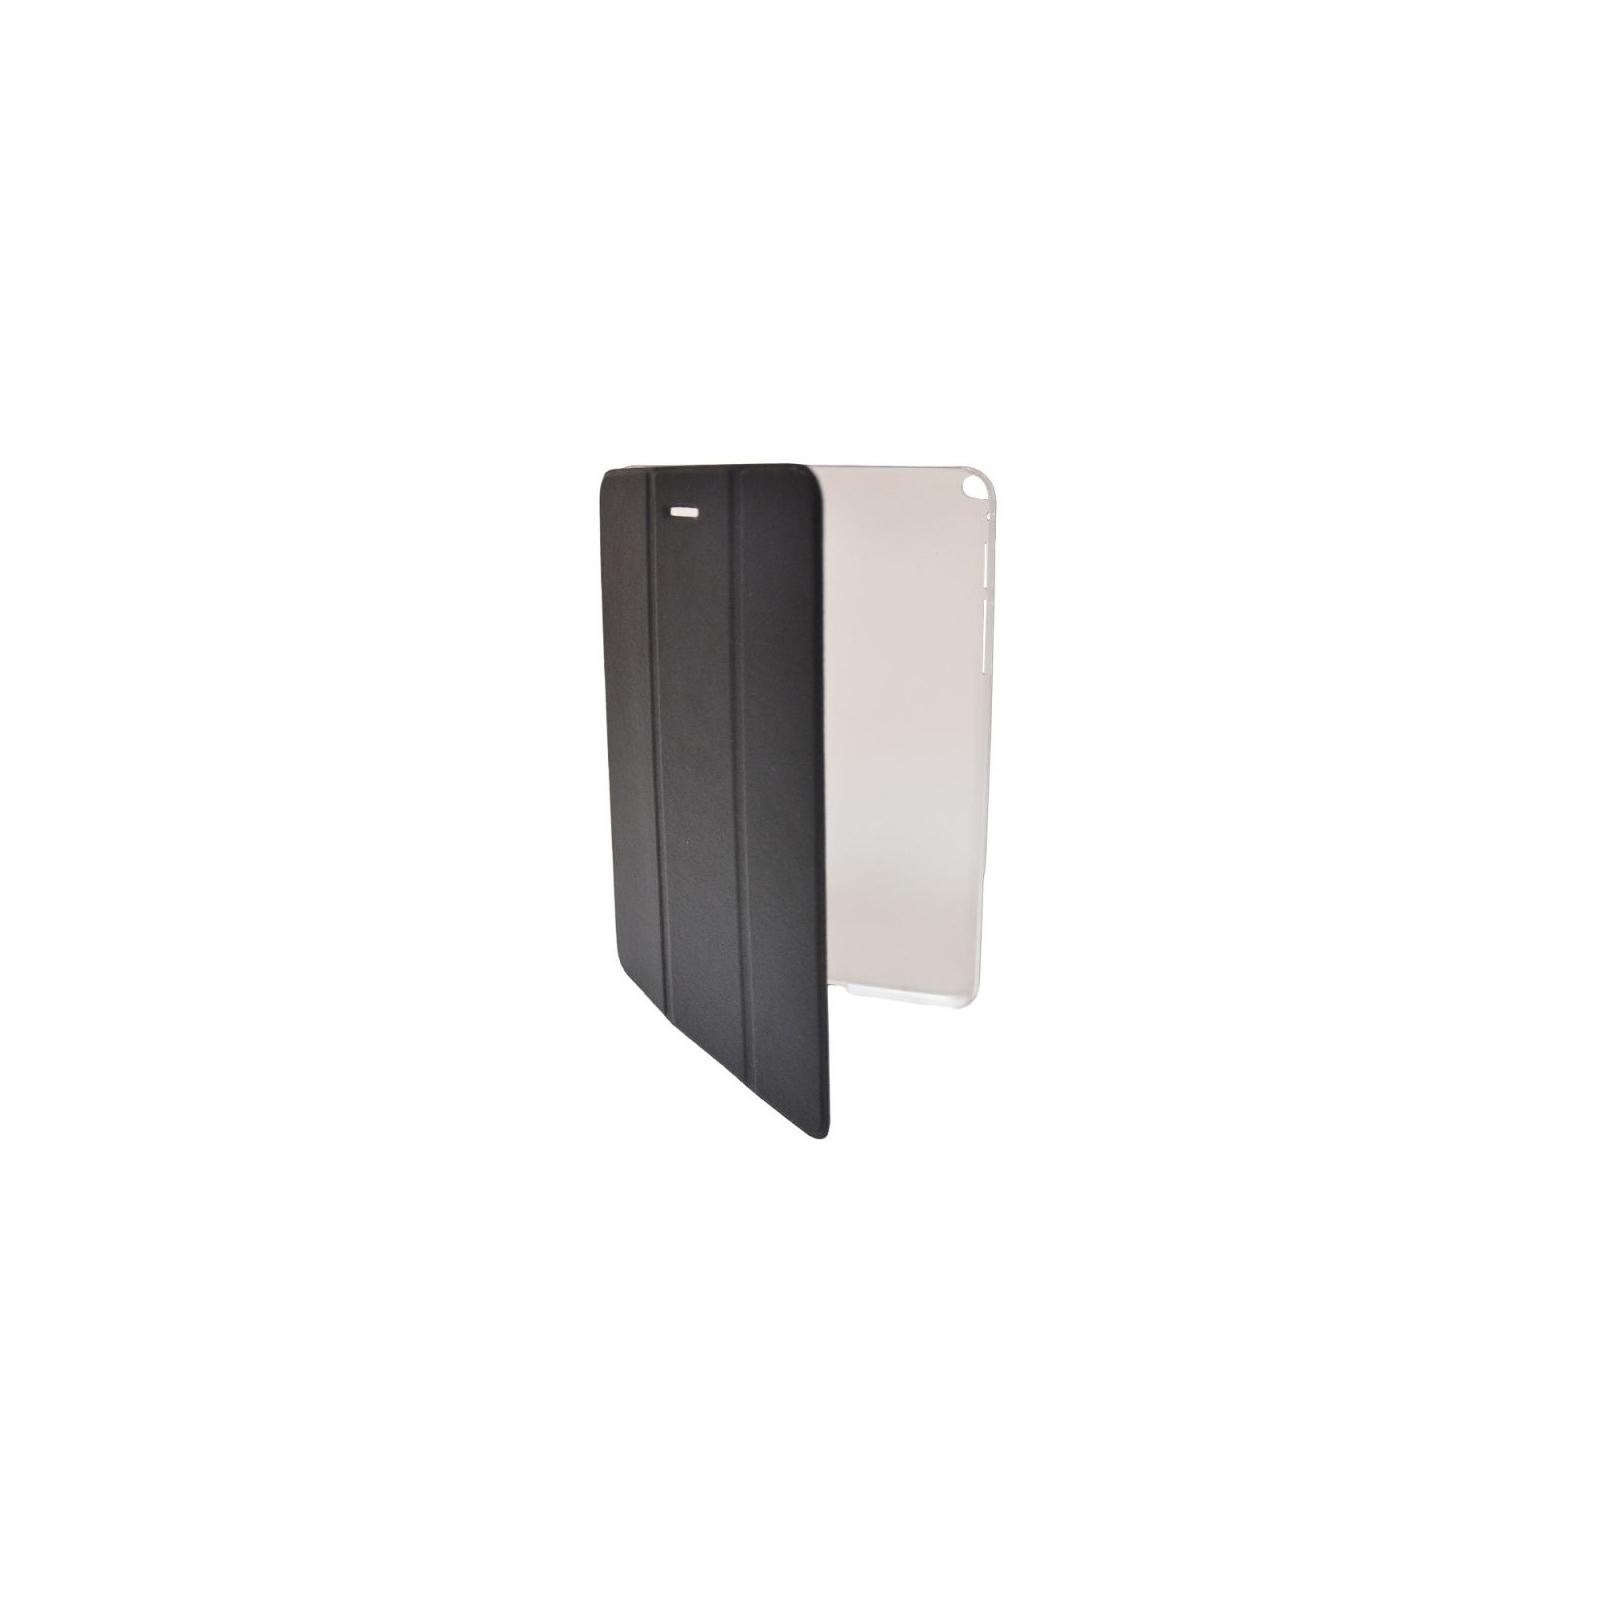 "Чехол для планшета Pro-case 8"" TFC Samsung T350/355(Tab A) Black (PCTFCT350Bl) изображение 3"